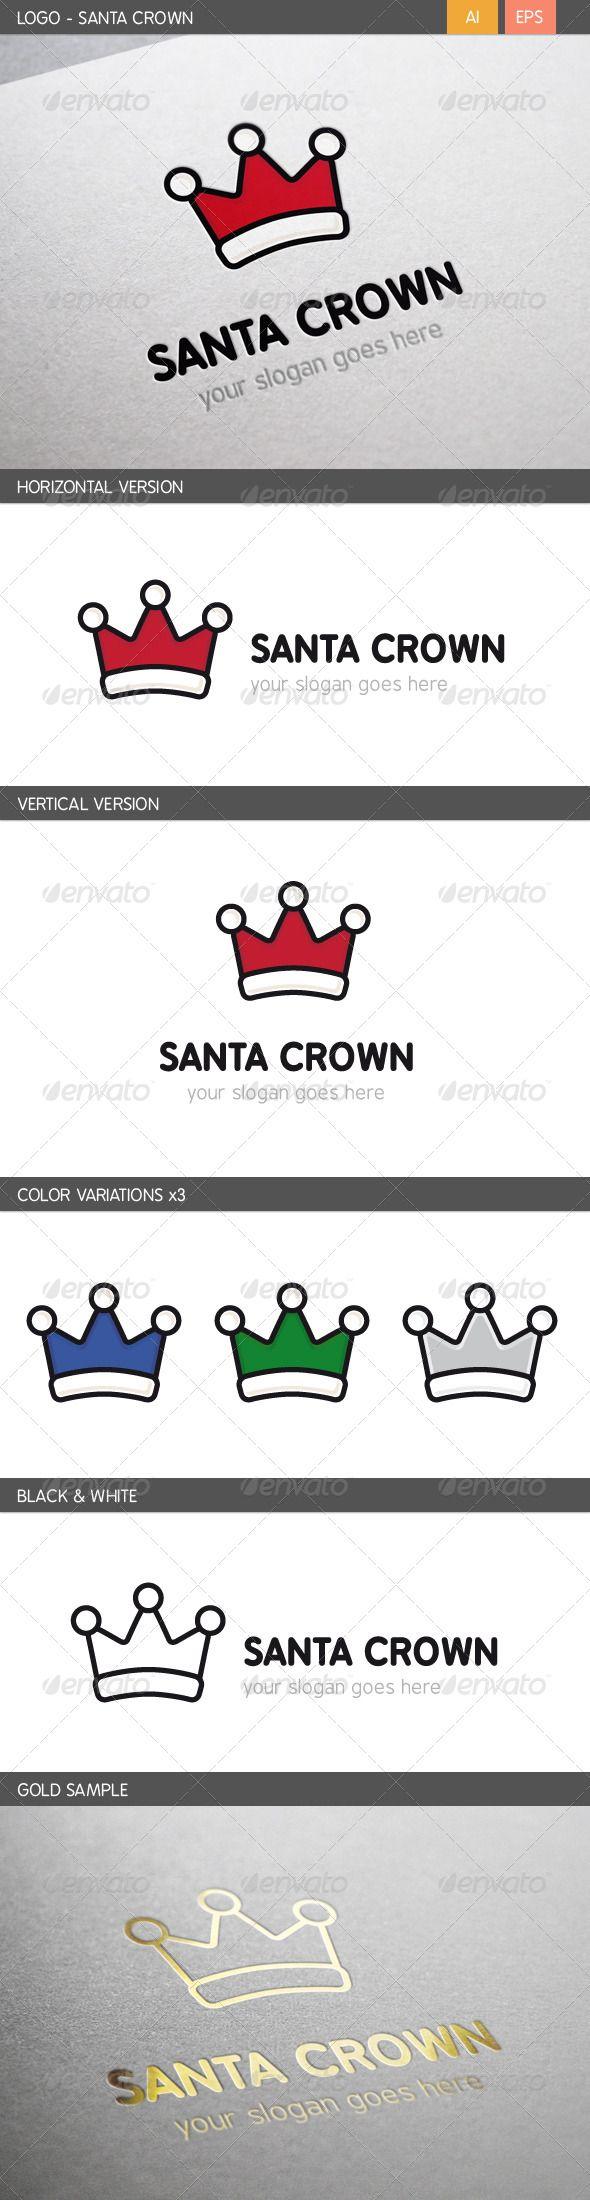 Santa Crown  - Logo Design Template Vector #logotype Download it here: http://graphicriver.net/item/santa-crown-logo/5815362?s_rank=1771?ref=nexion